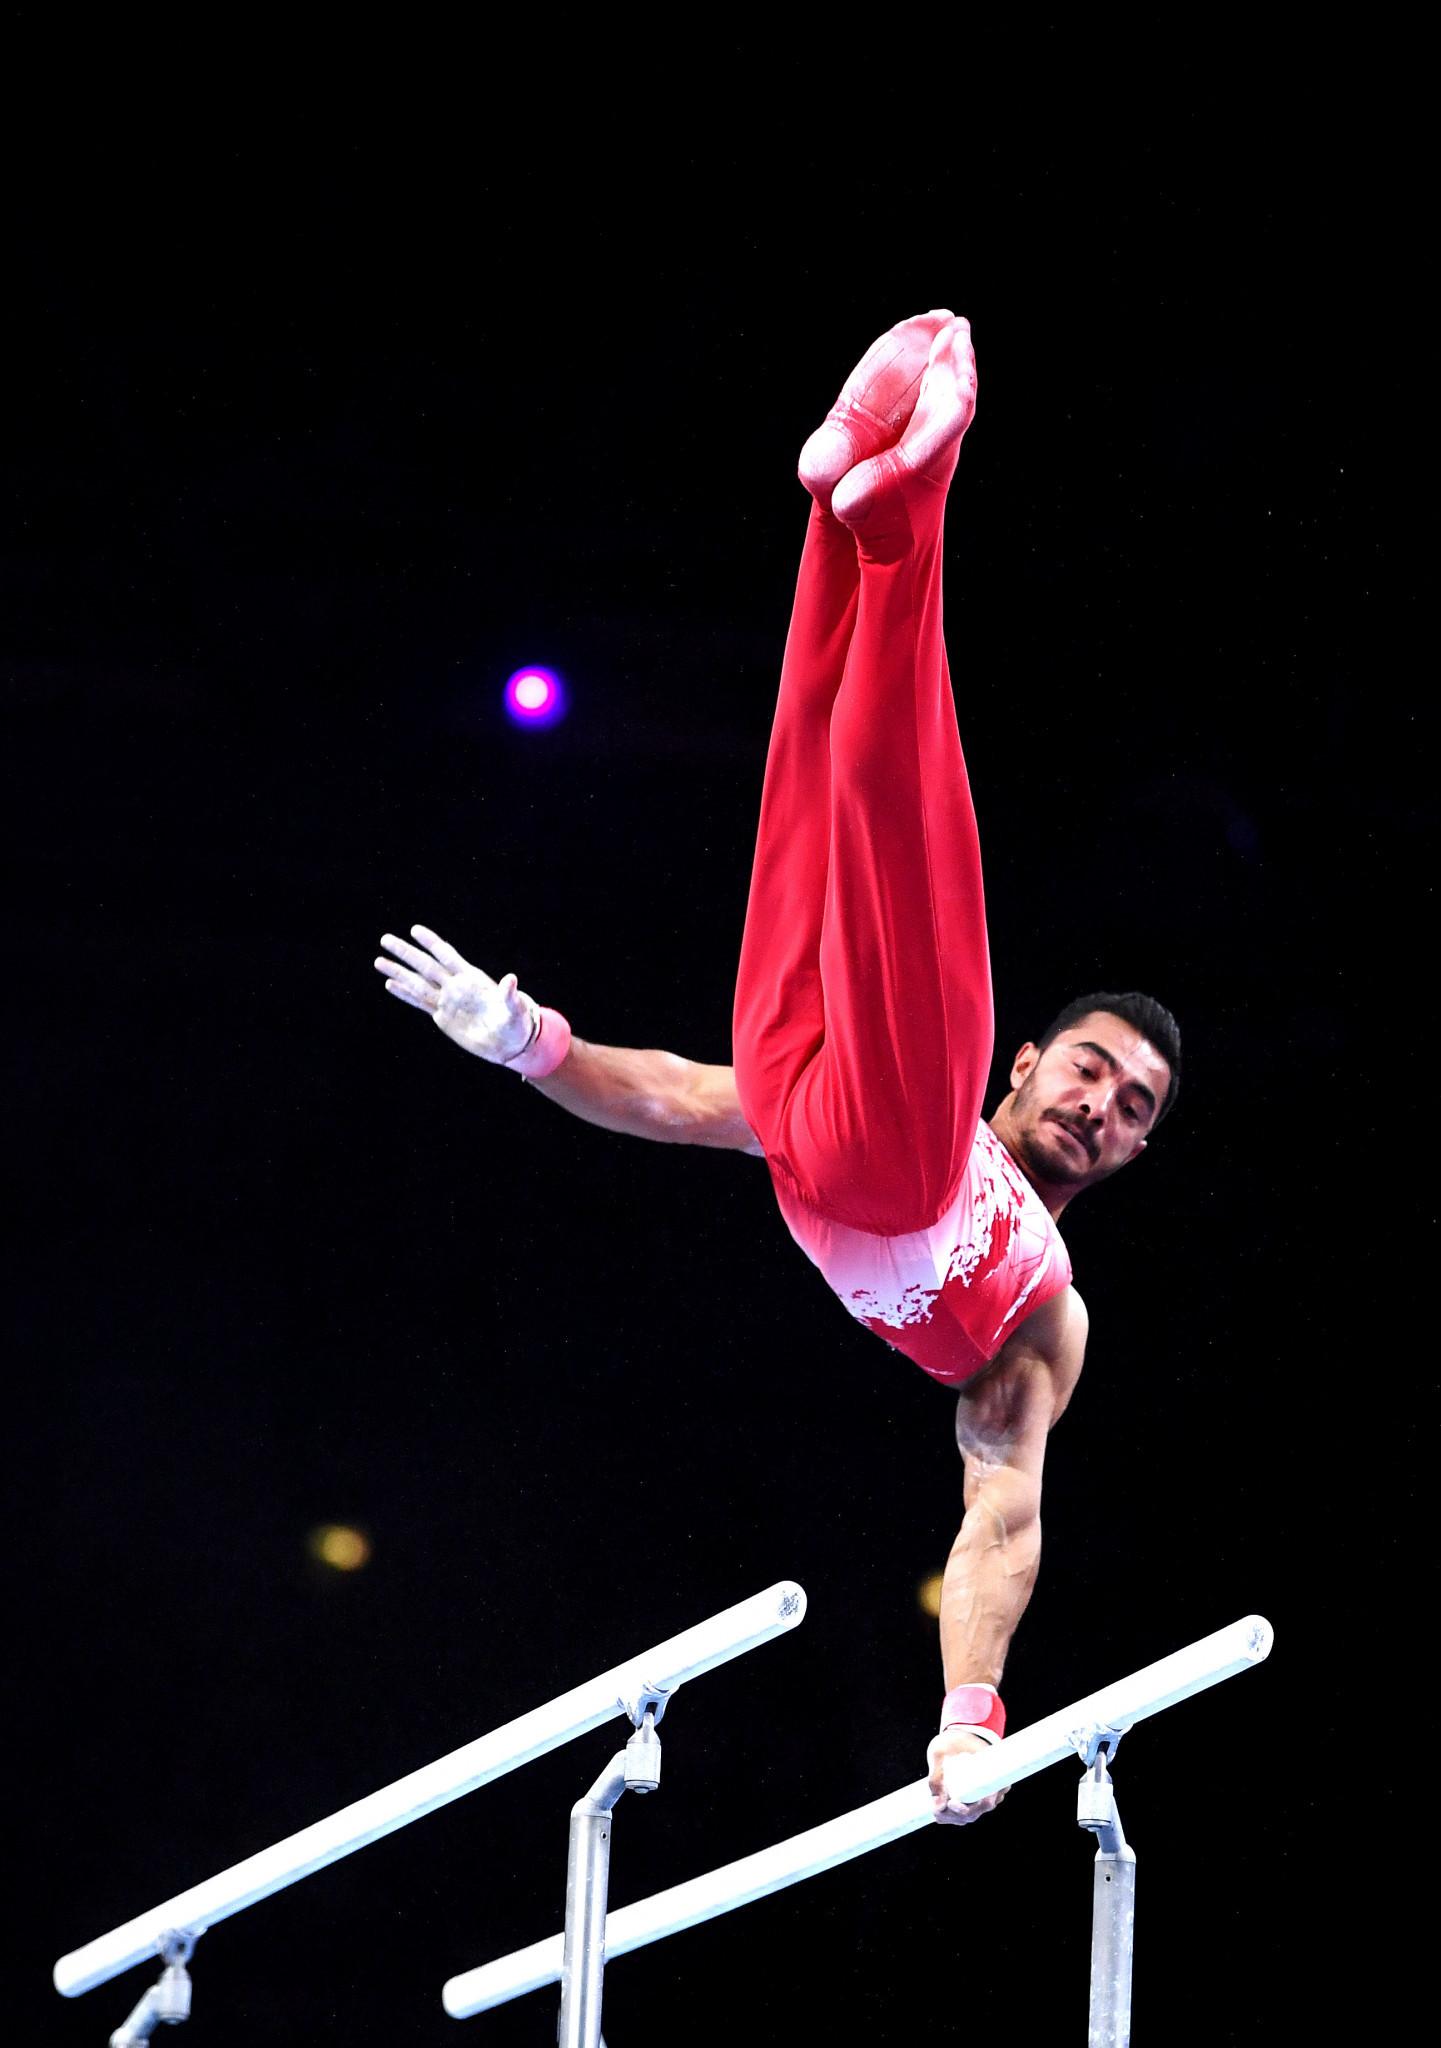 Arican and Çolak star for hosts Turkey in European Men's Artistic Gymnastics Championships qualifying